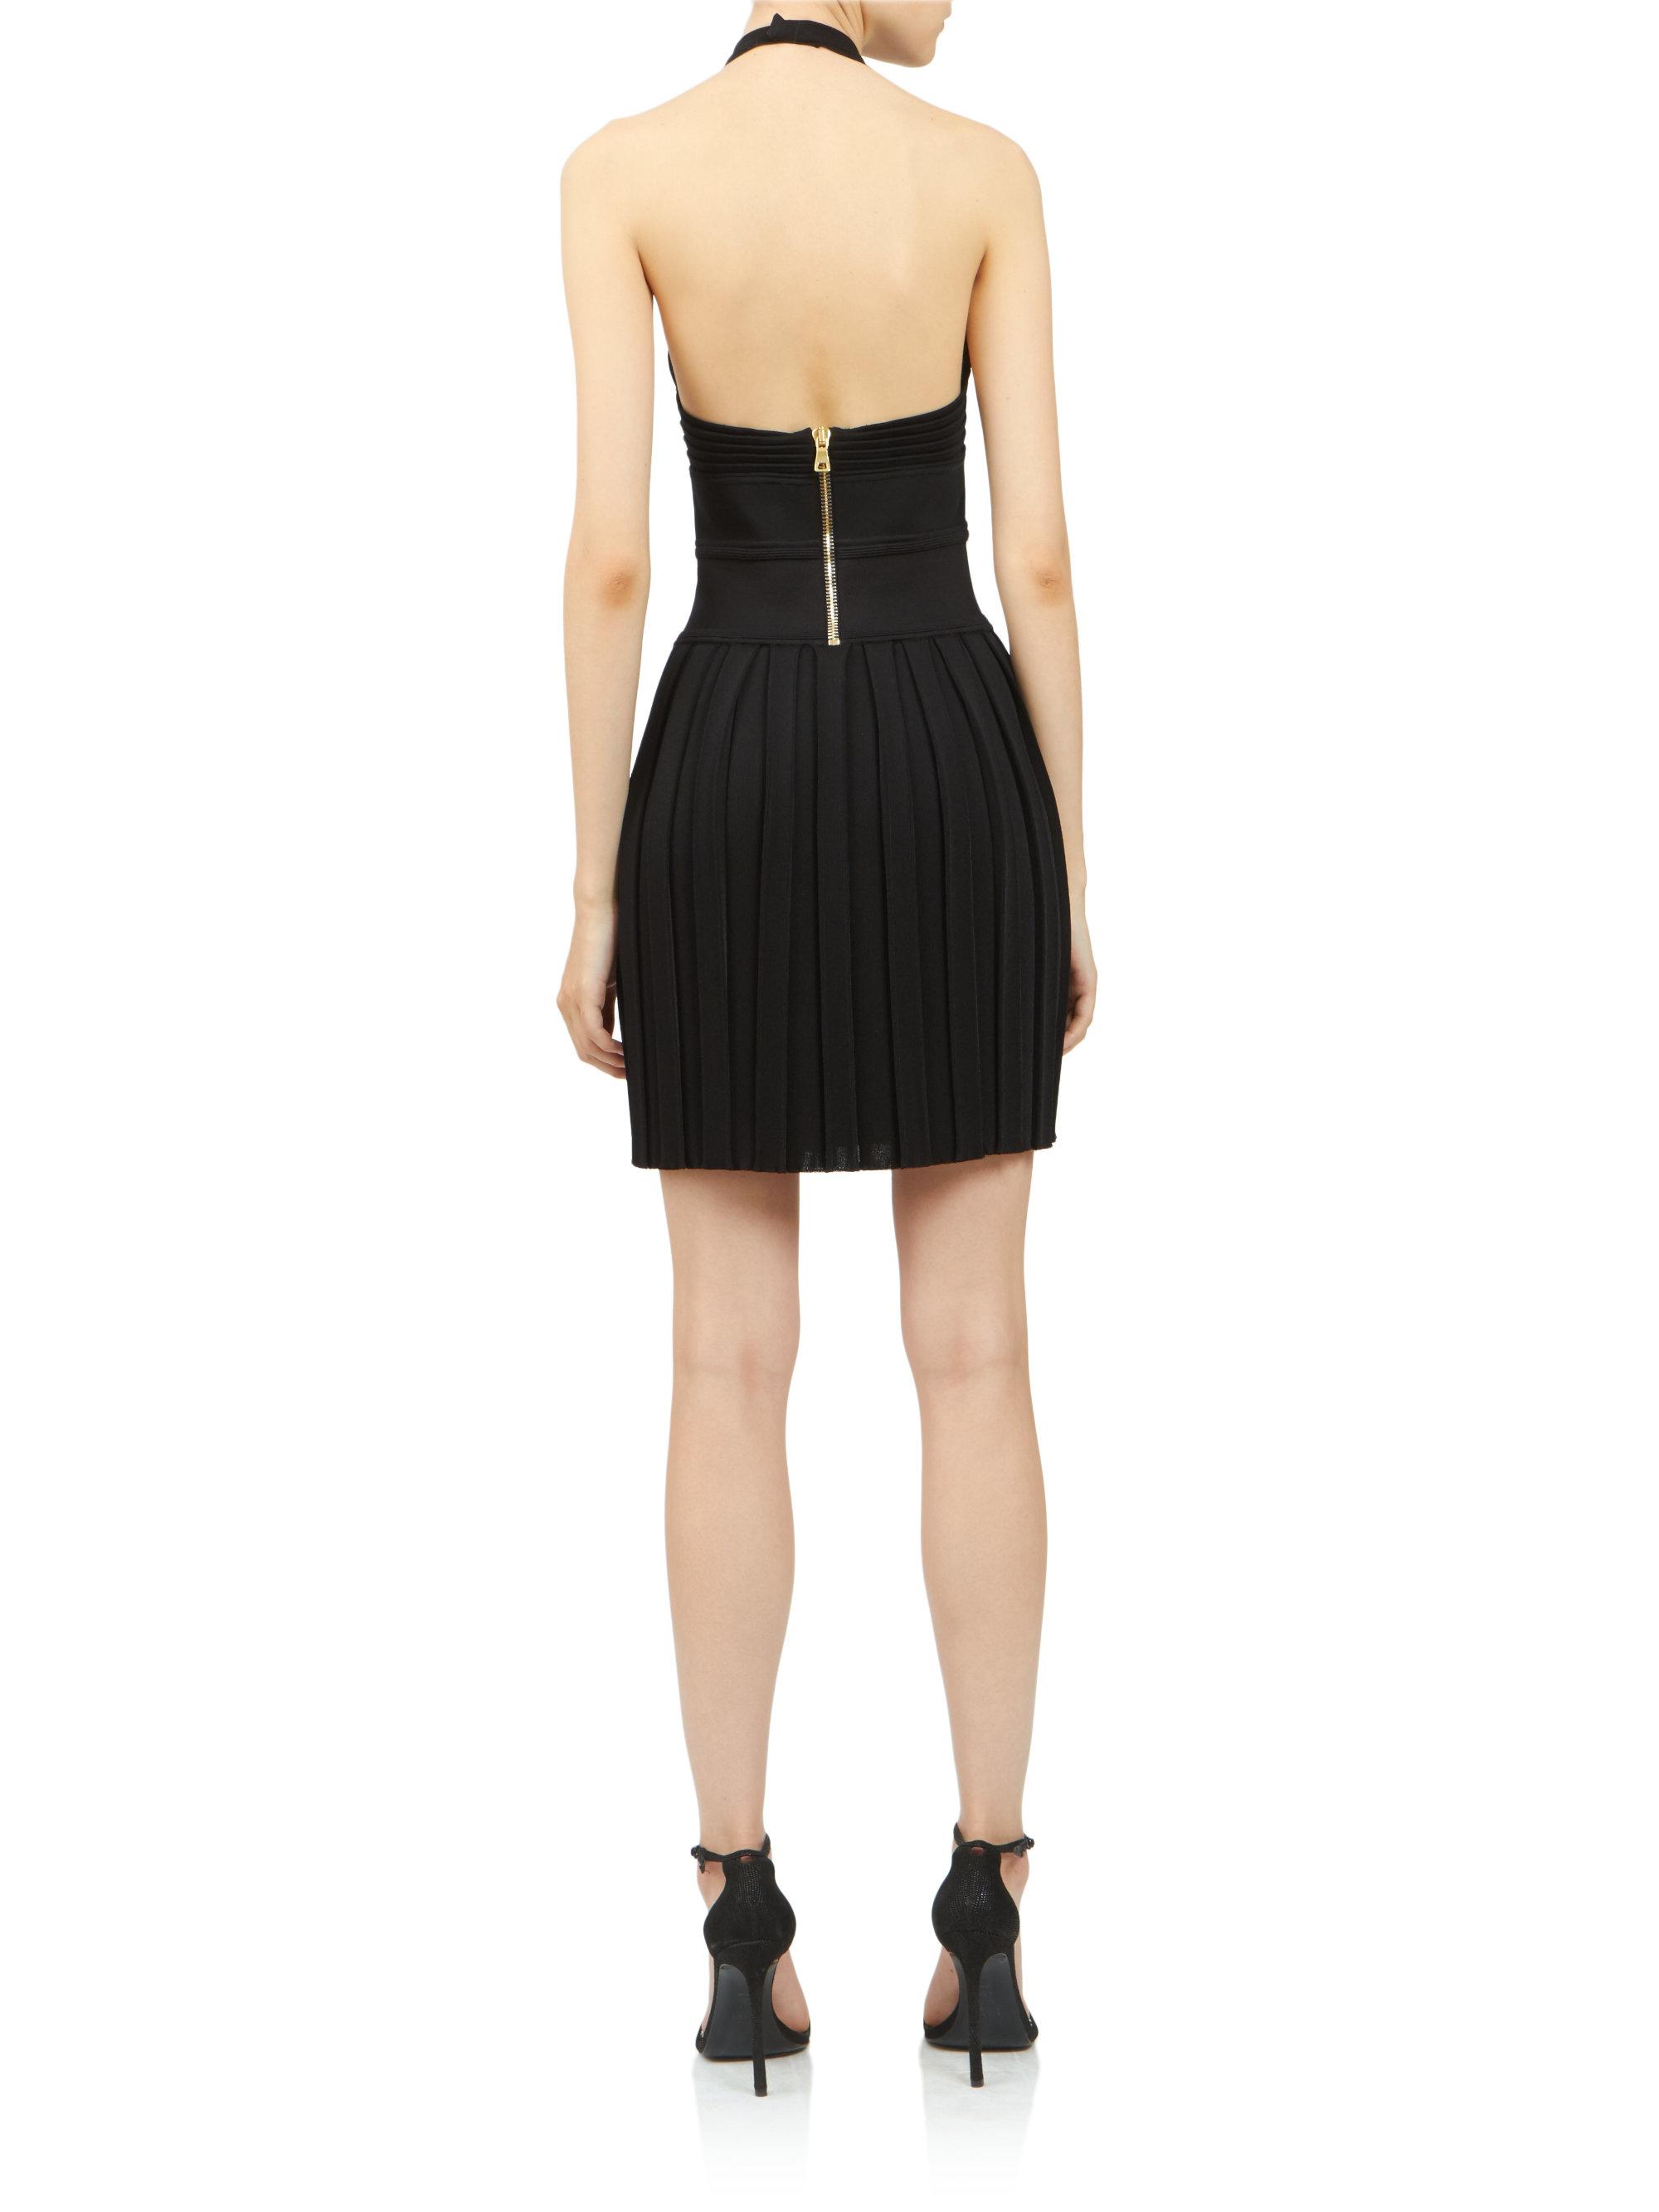 fb9afe232b2c Balmain Pleated Halter Cocktail Dress in Black - Lyst